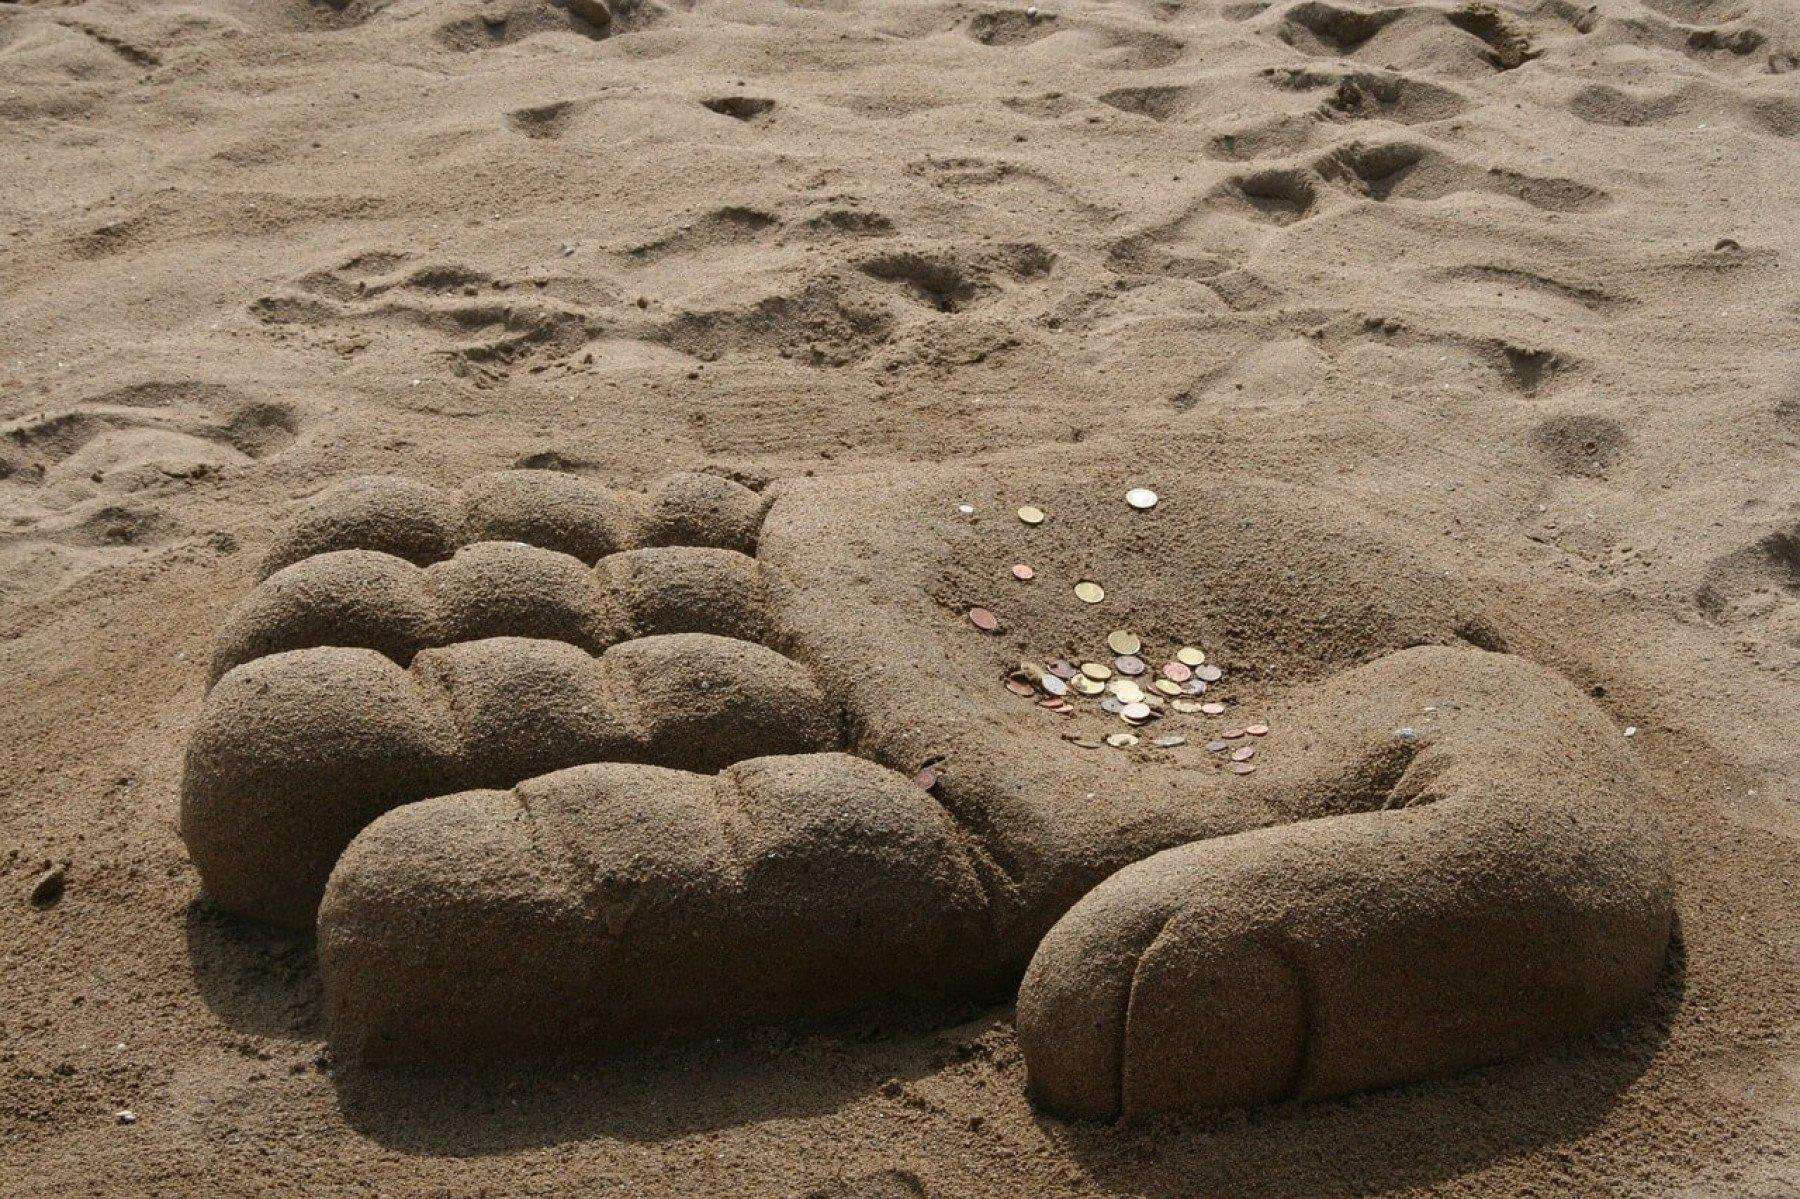 En strand med ett sandslott som liknar en hand. På handen ligger det mynt